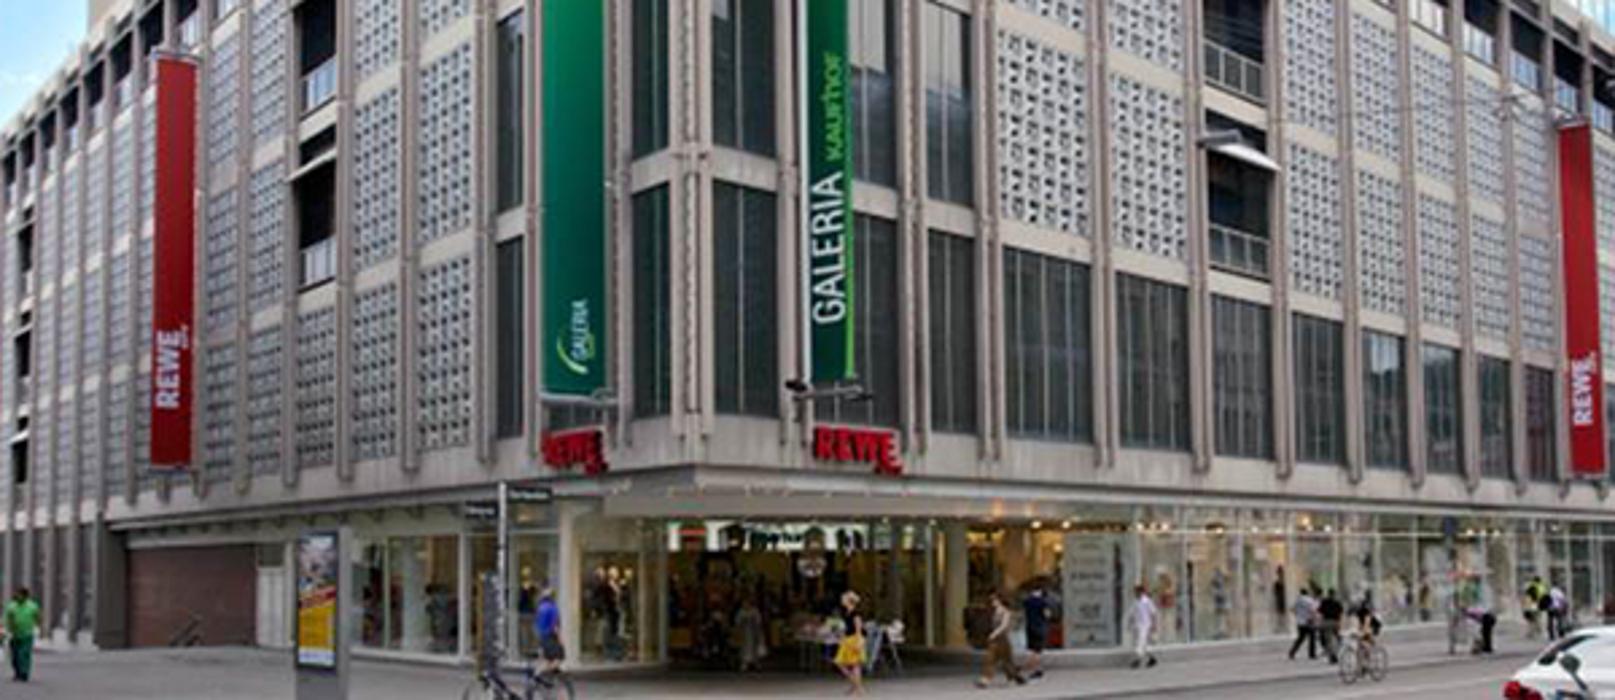 GALERIA (Kaufhof) Stuttgart Eberhardstraße, Eberhardstraße in Stuttgart